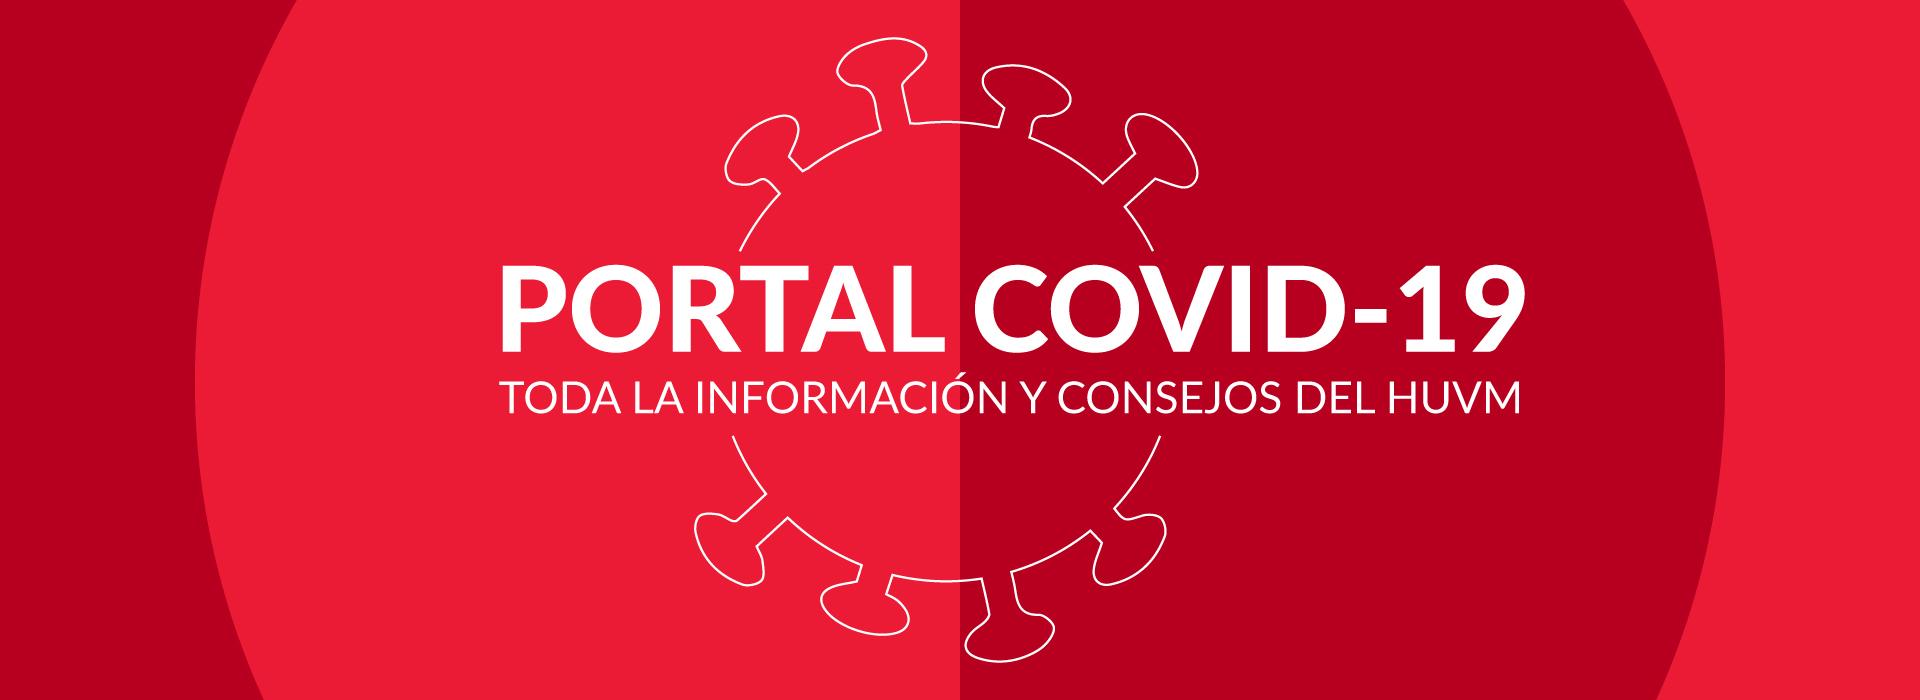 Portal COVID-19 HUVM